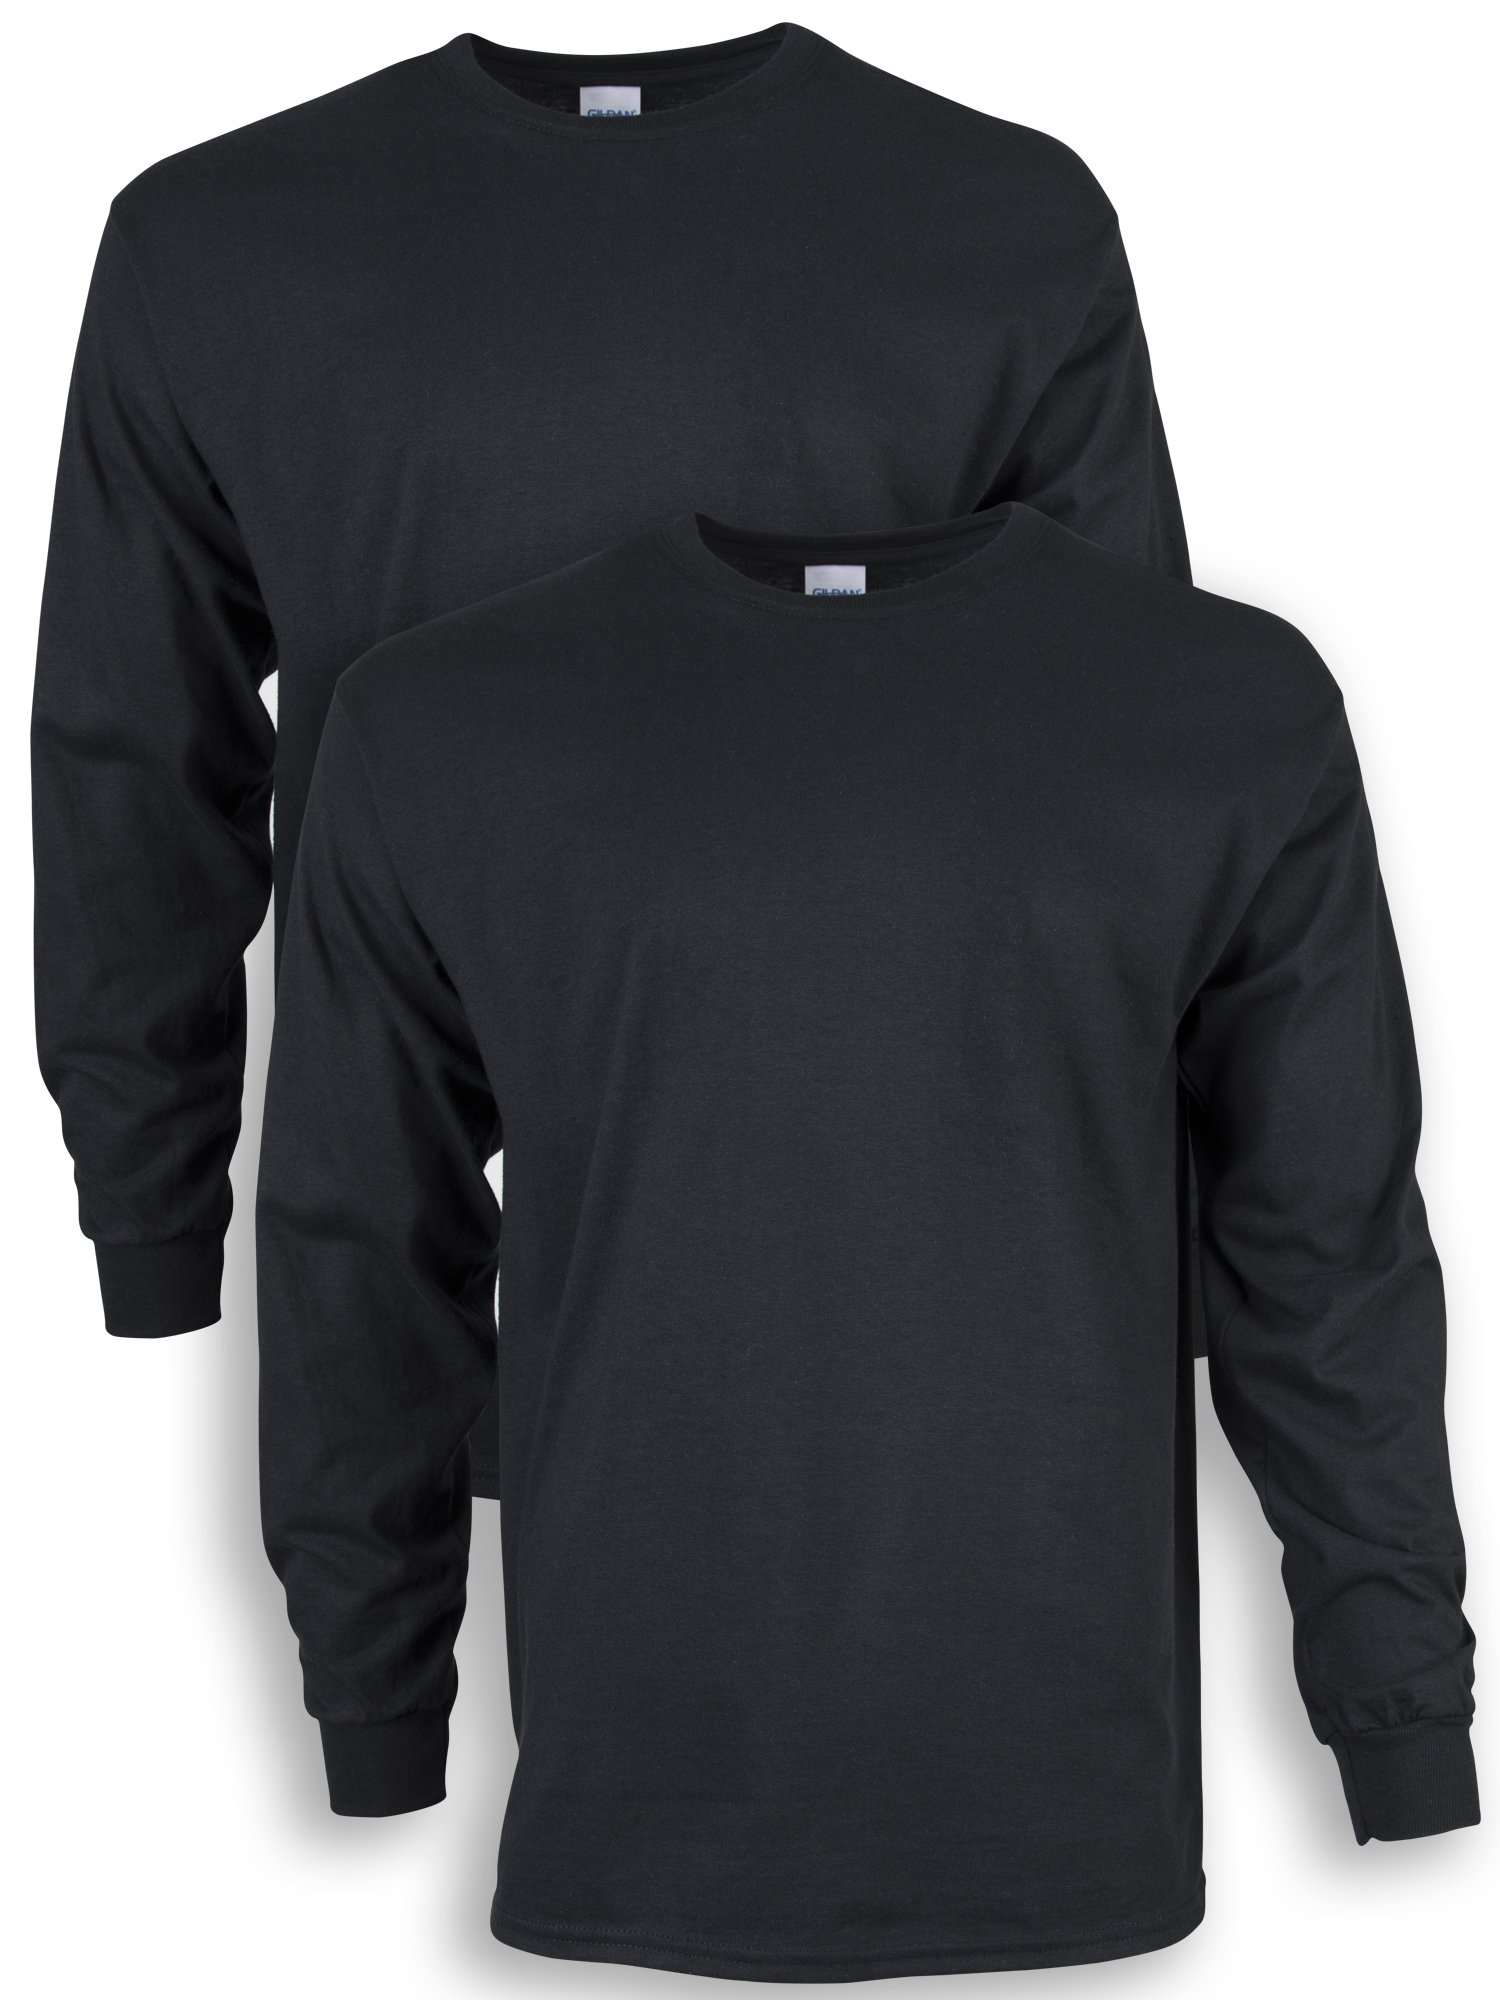 Gildan Men's Ultra Cotton Adult Long Sleeve T-Shirt, 2-Pack, Black, Large